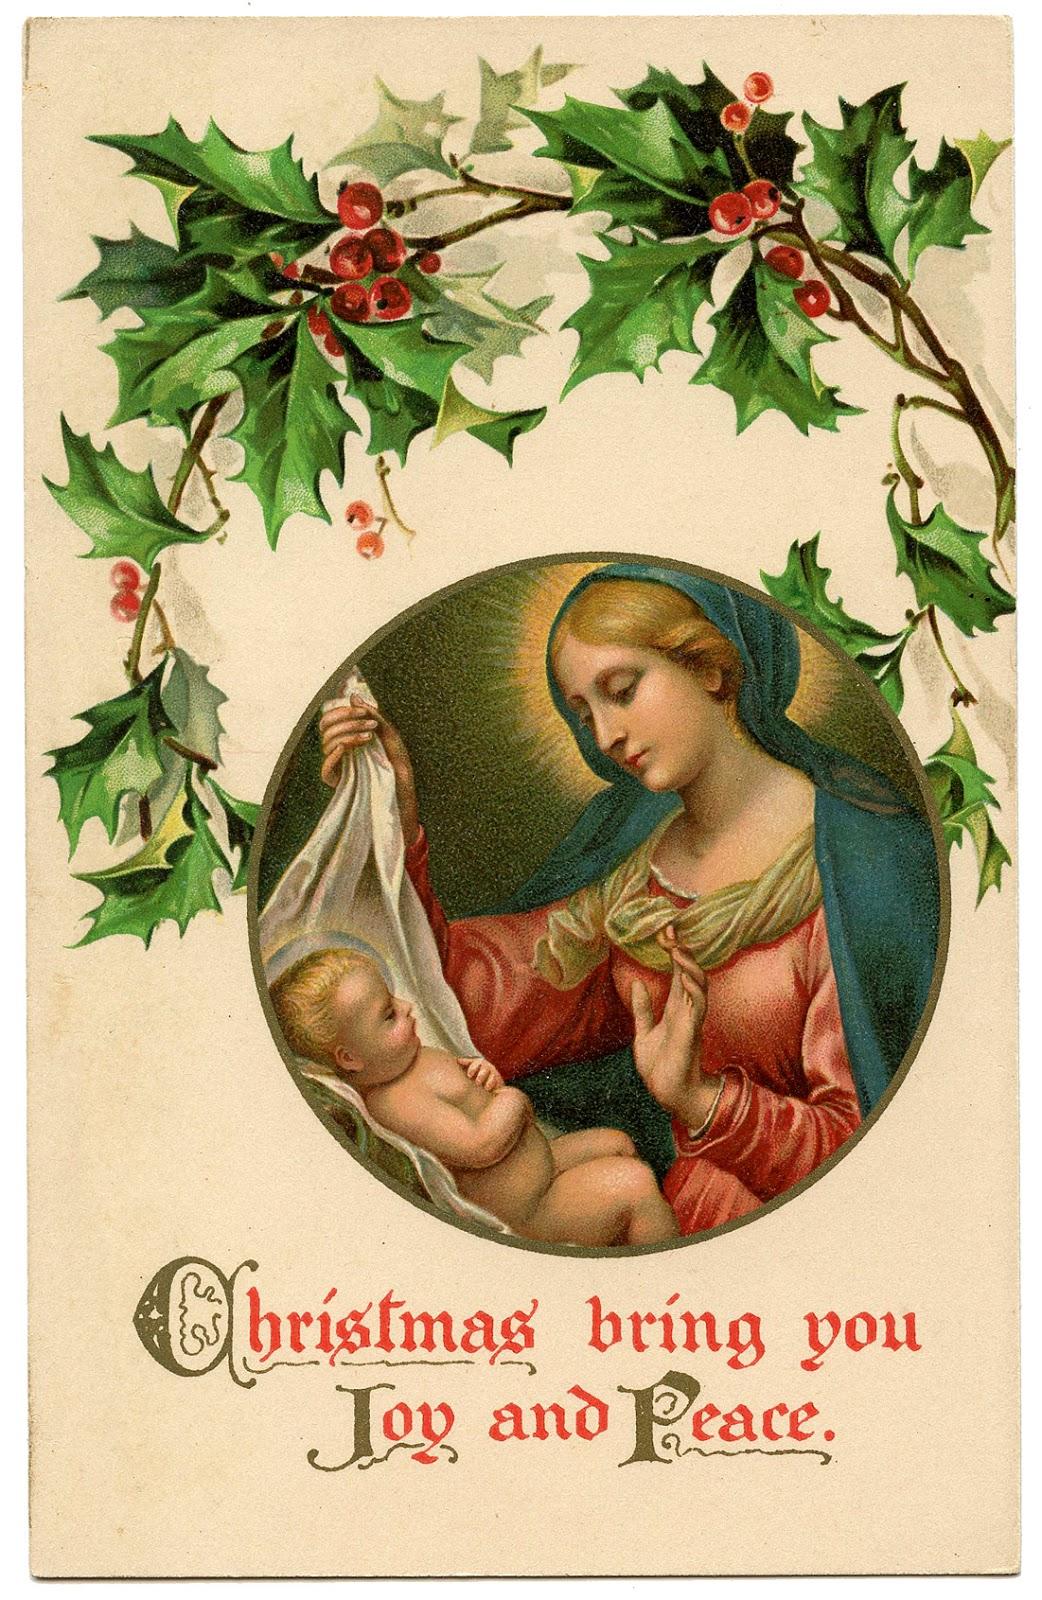 http://thegraphicsfairy.com/wp-content/uploads/2012/12/ChristmasJesusMary-GraphicsFairy1.jpg